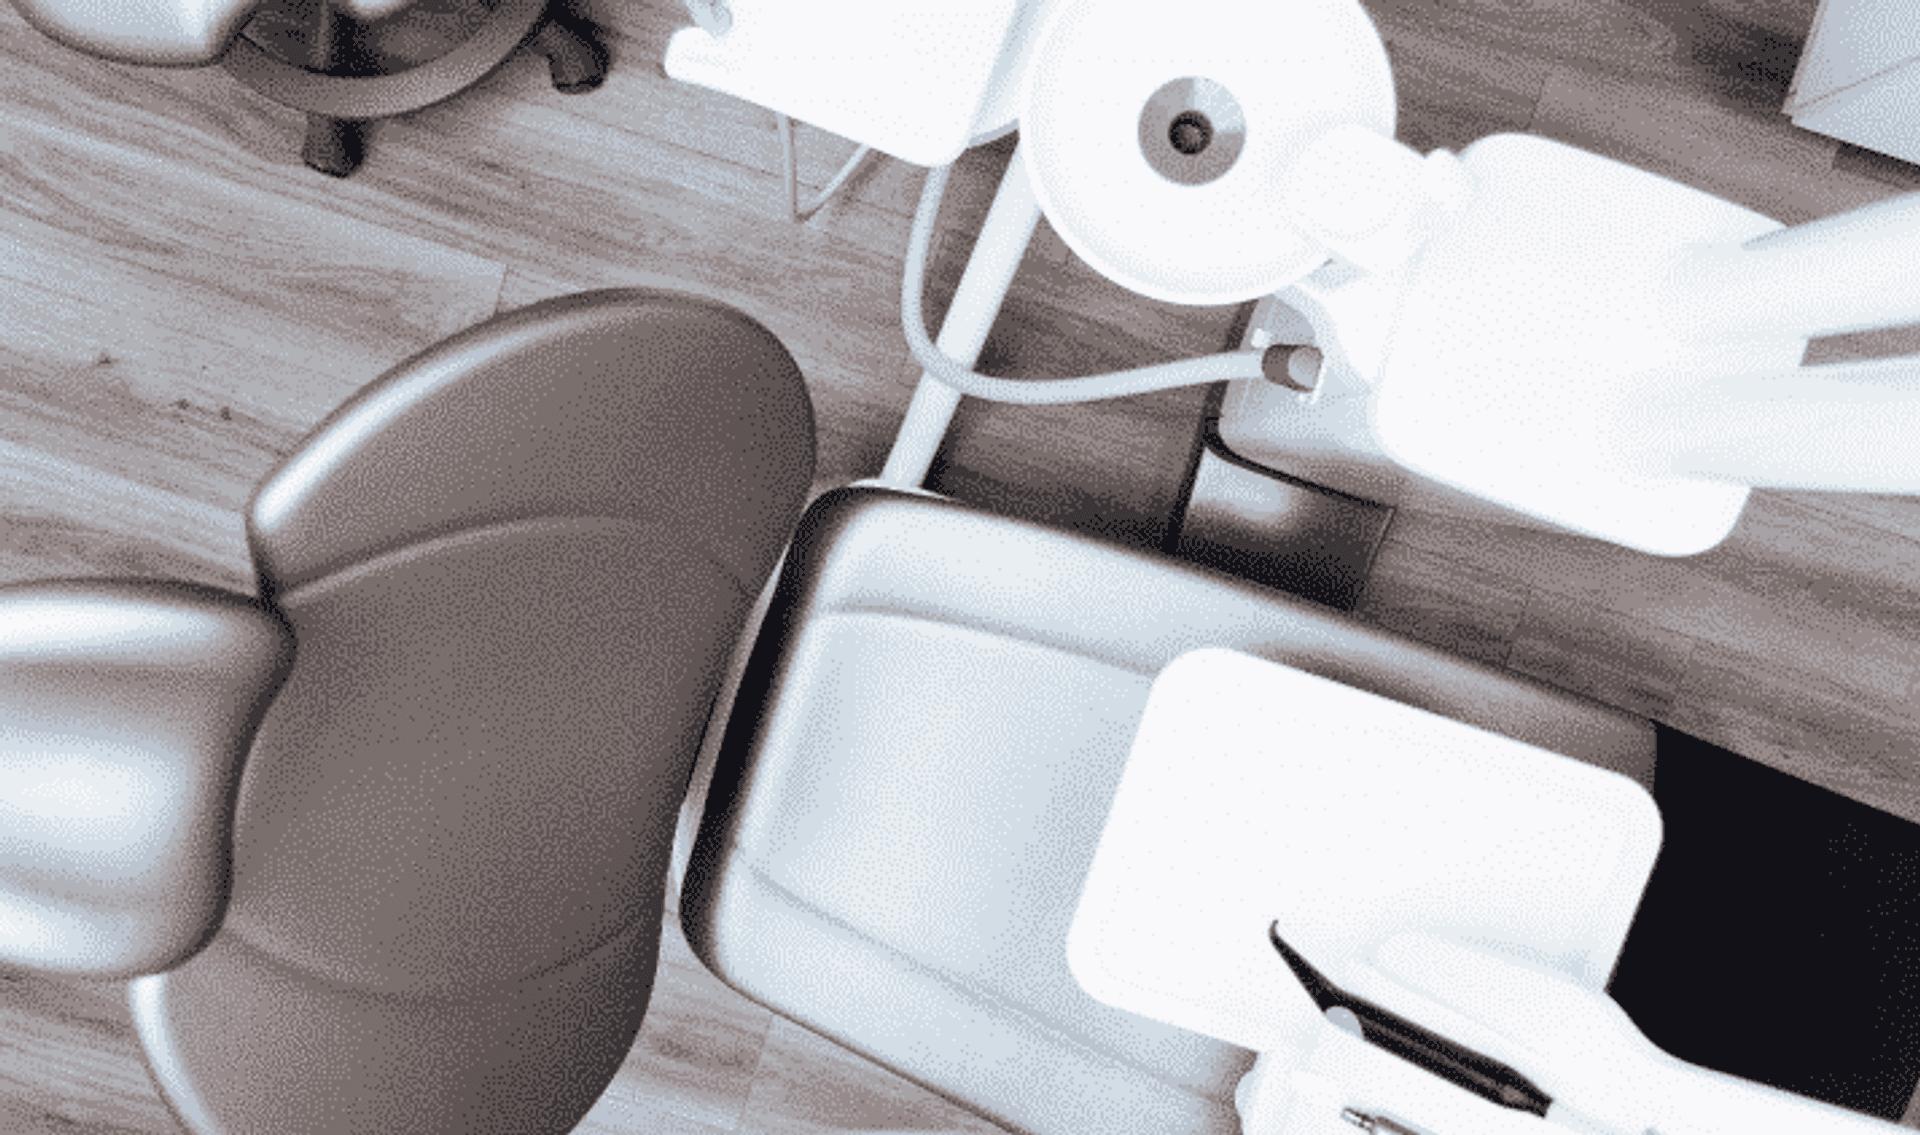 Comfy Dentist Chair